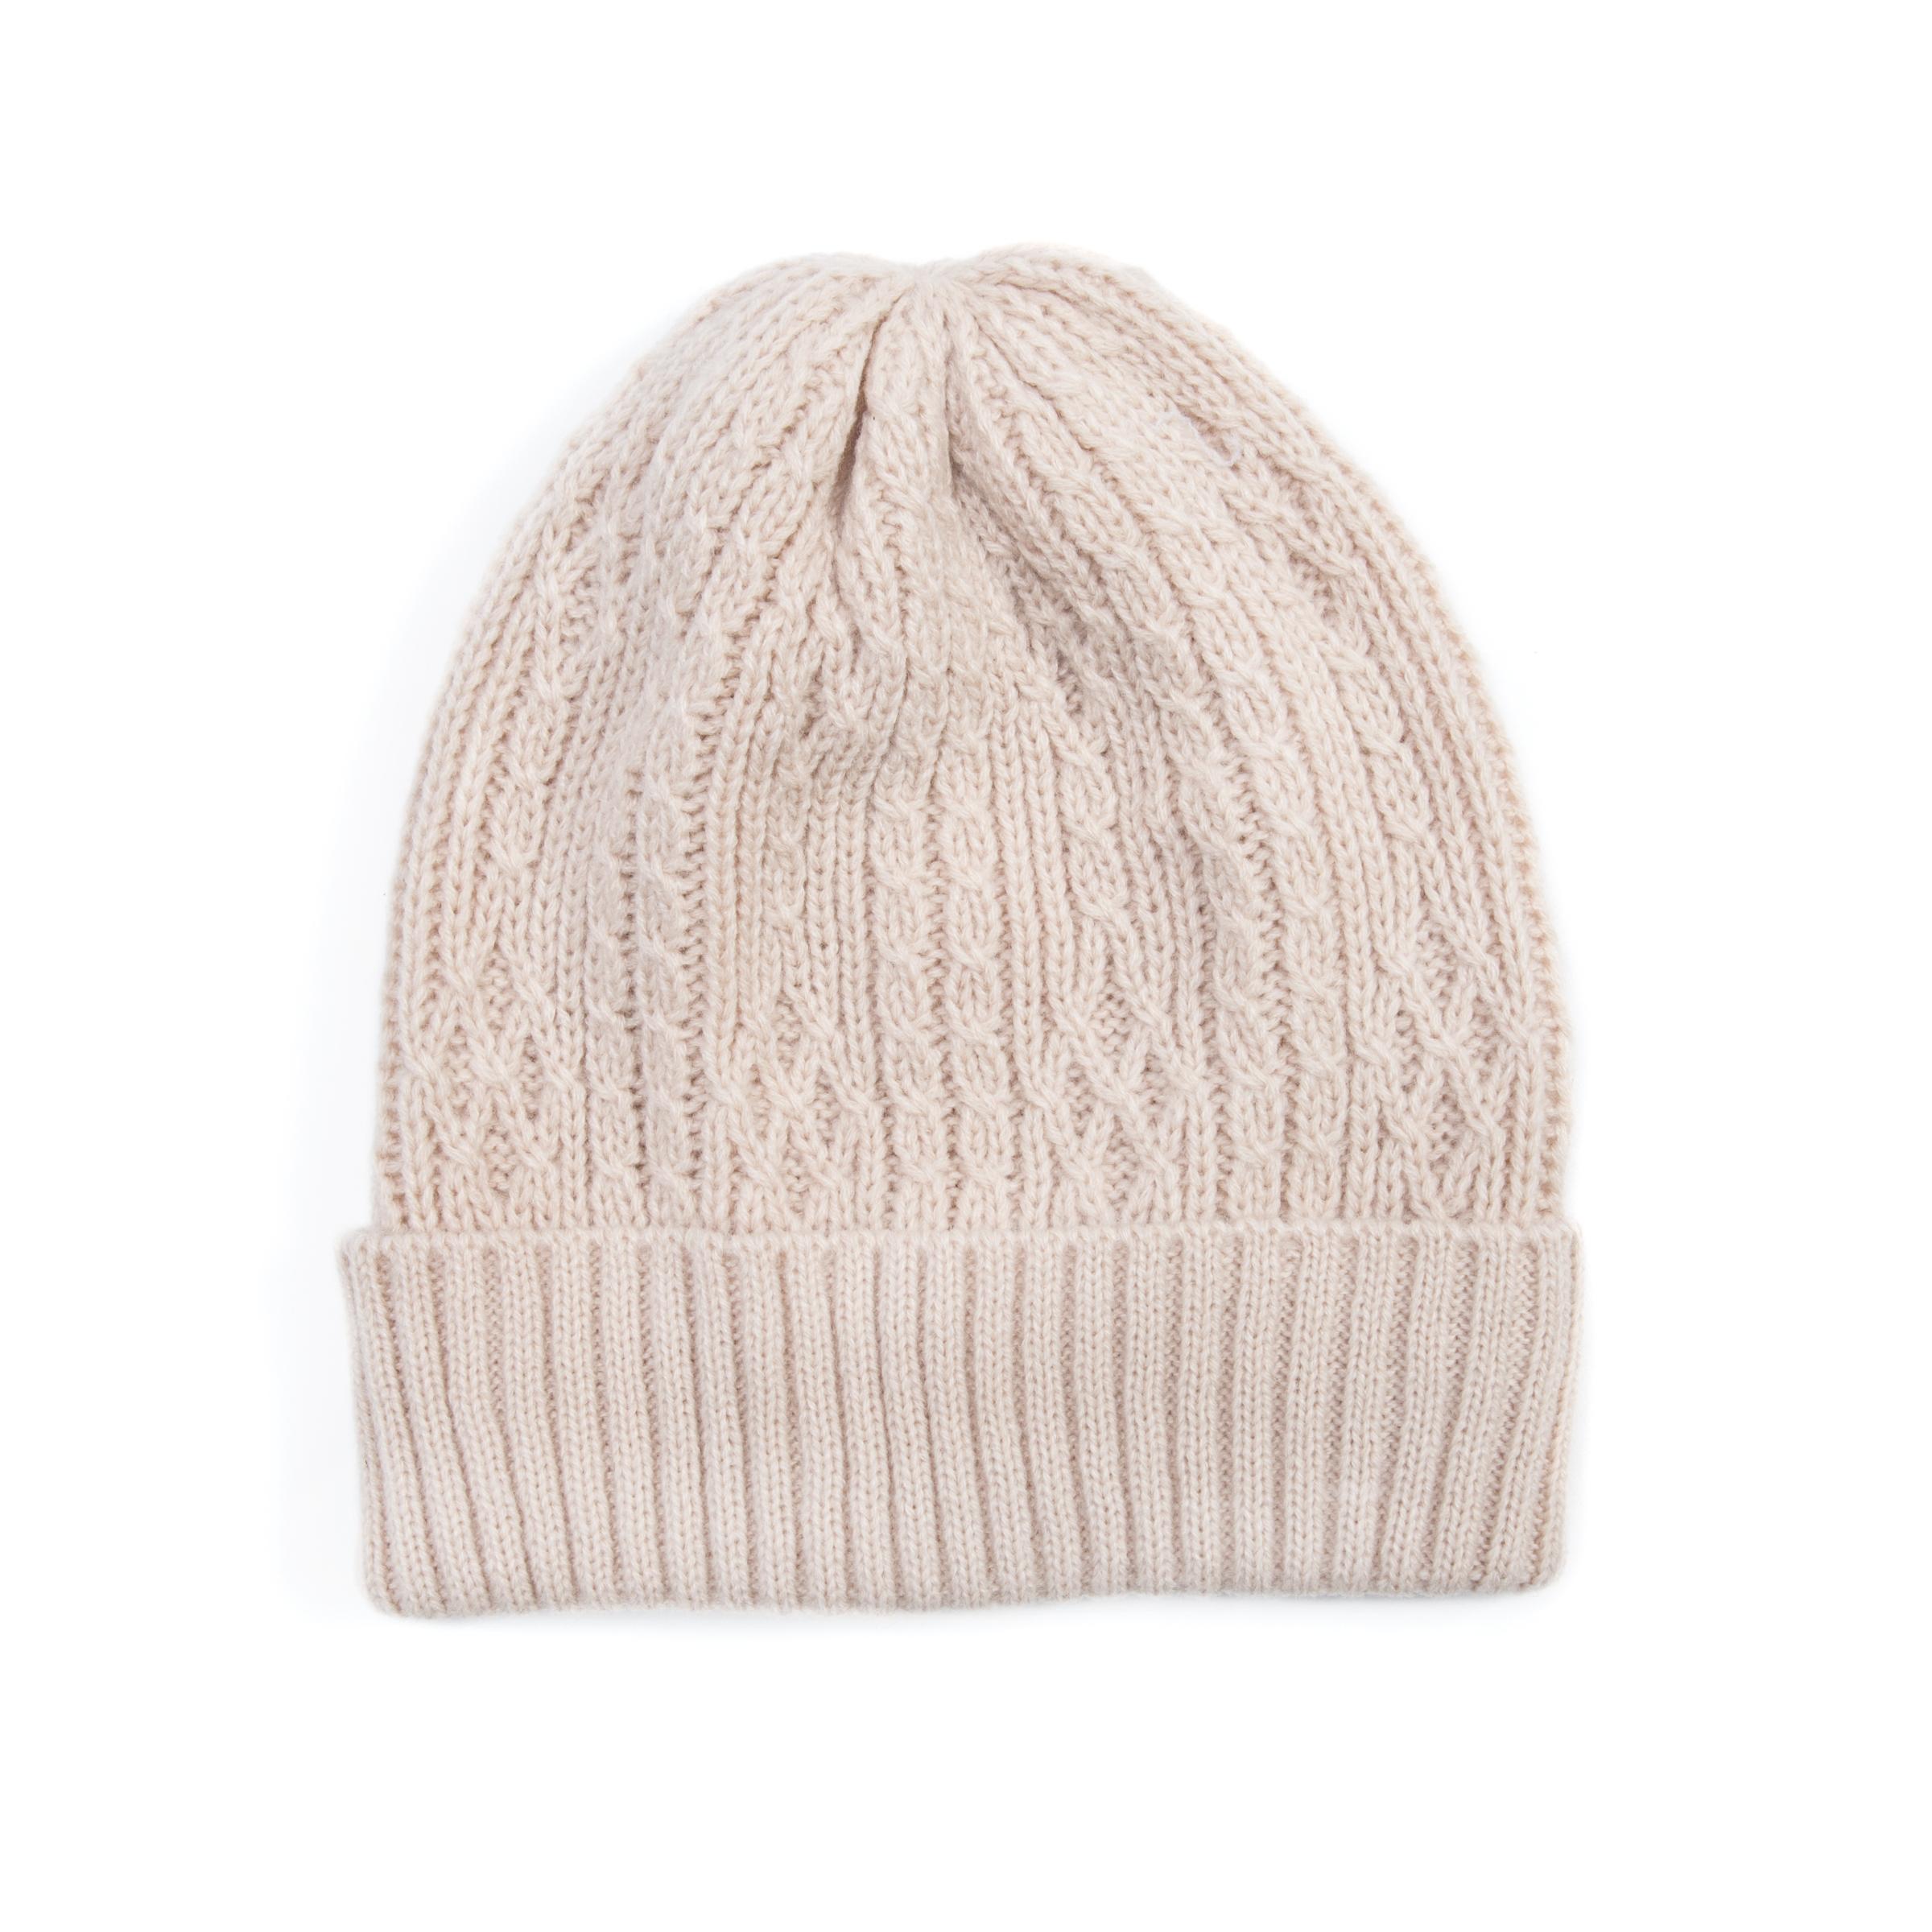 Home Women Accessories Hats   Caps Skullies   Beanies MUK LUKS® Women s  Textured Cuff Cap – Rose e47f373ec5c